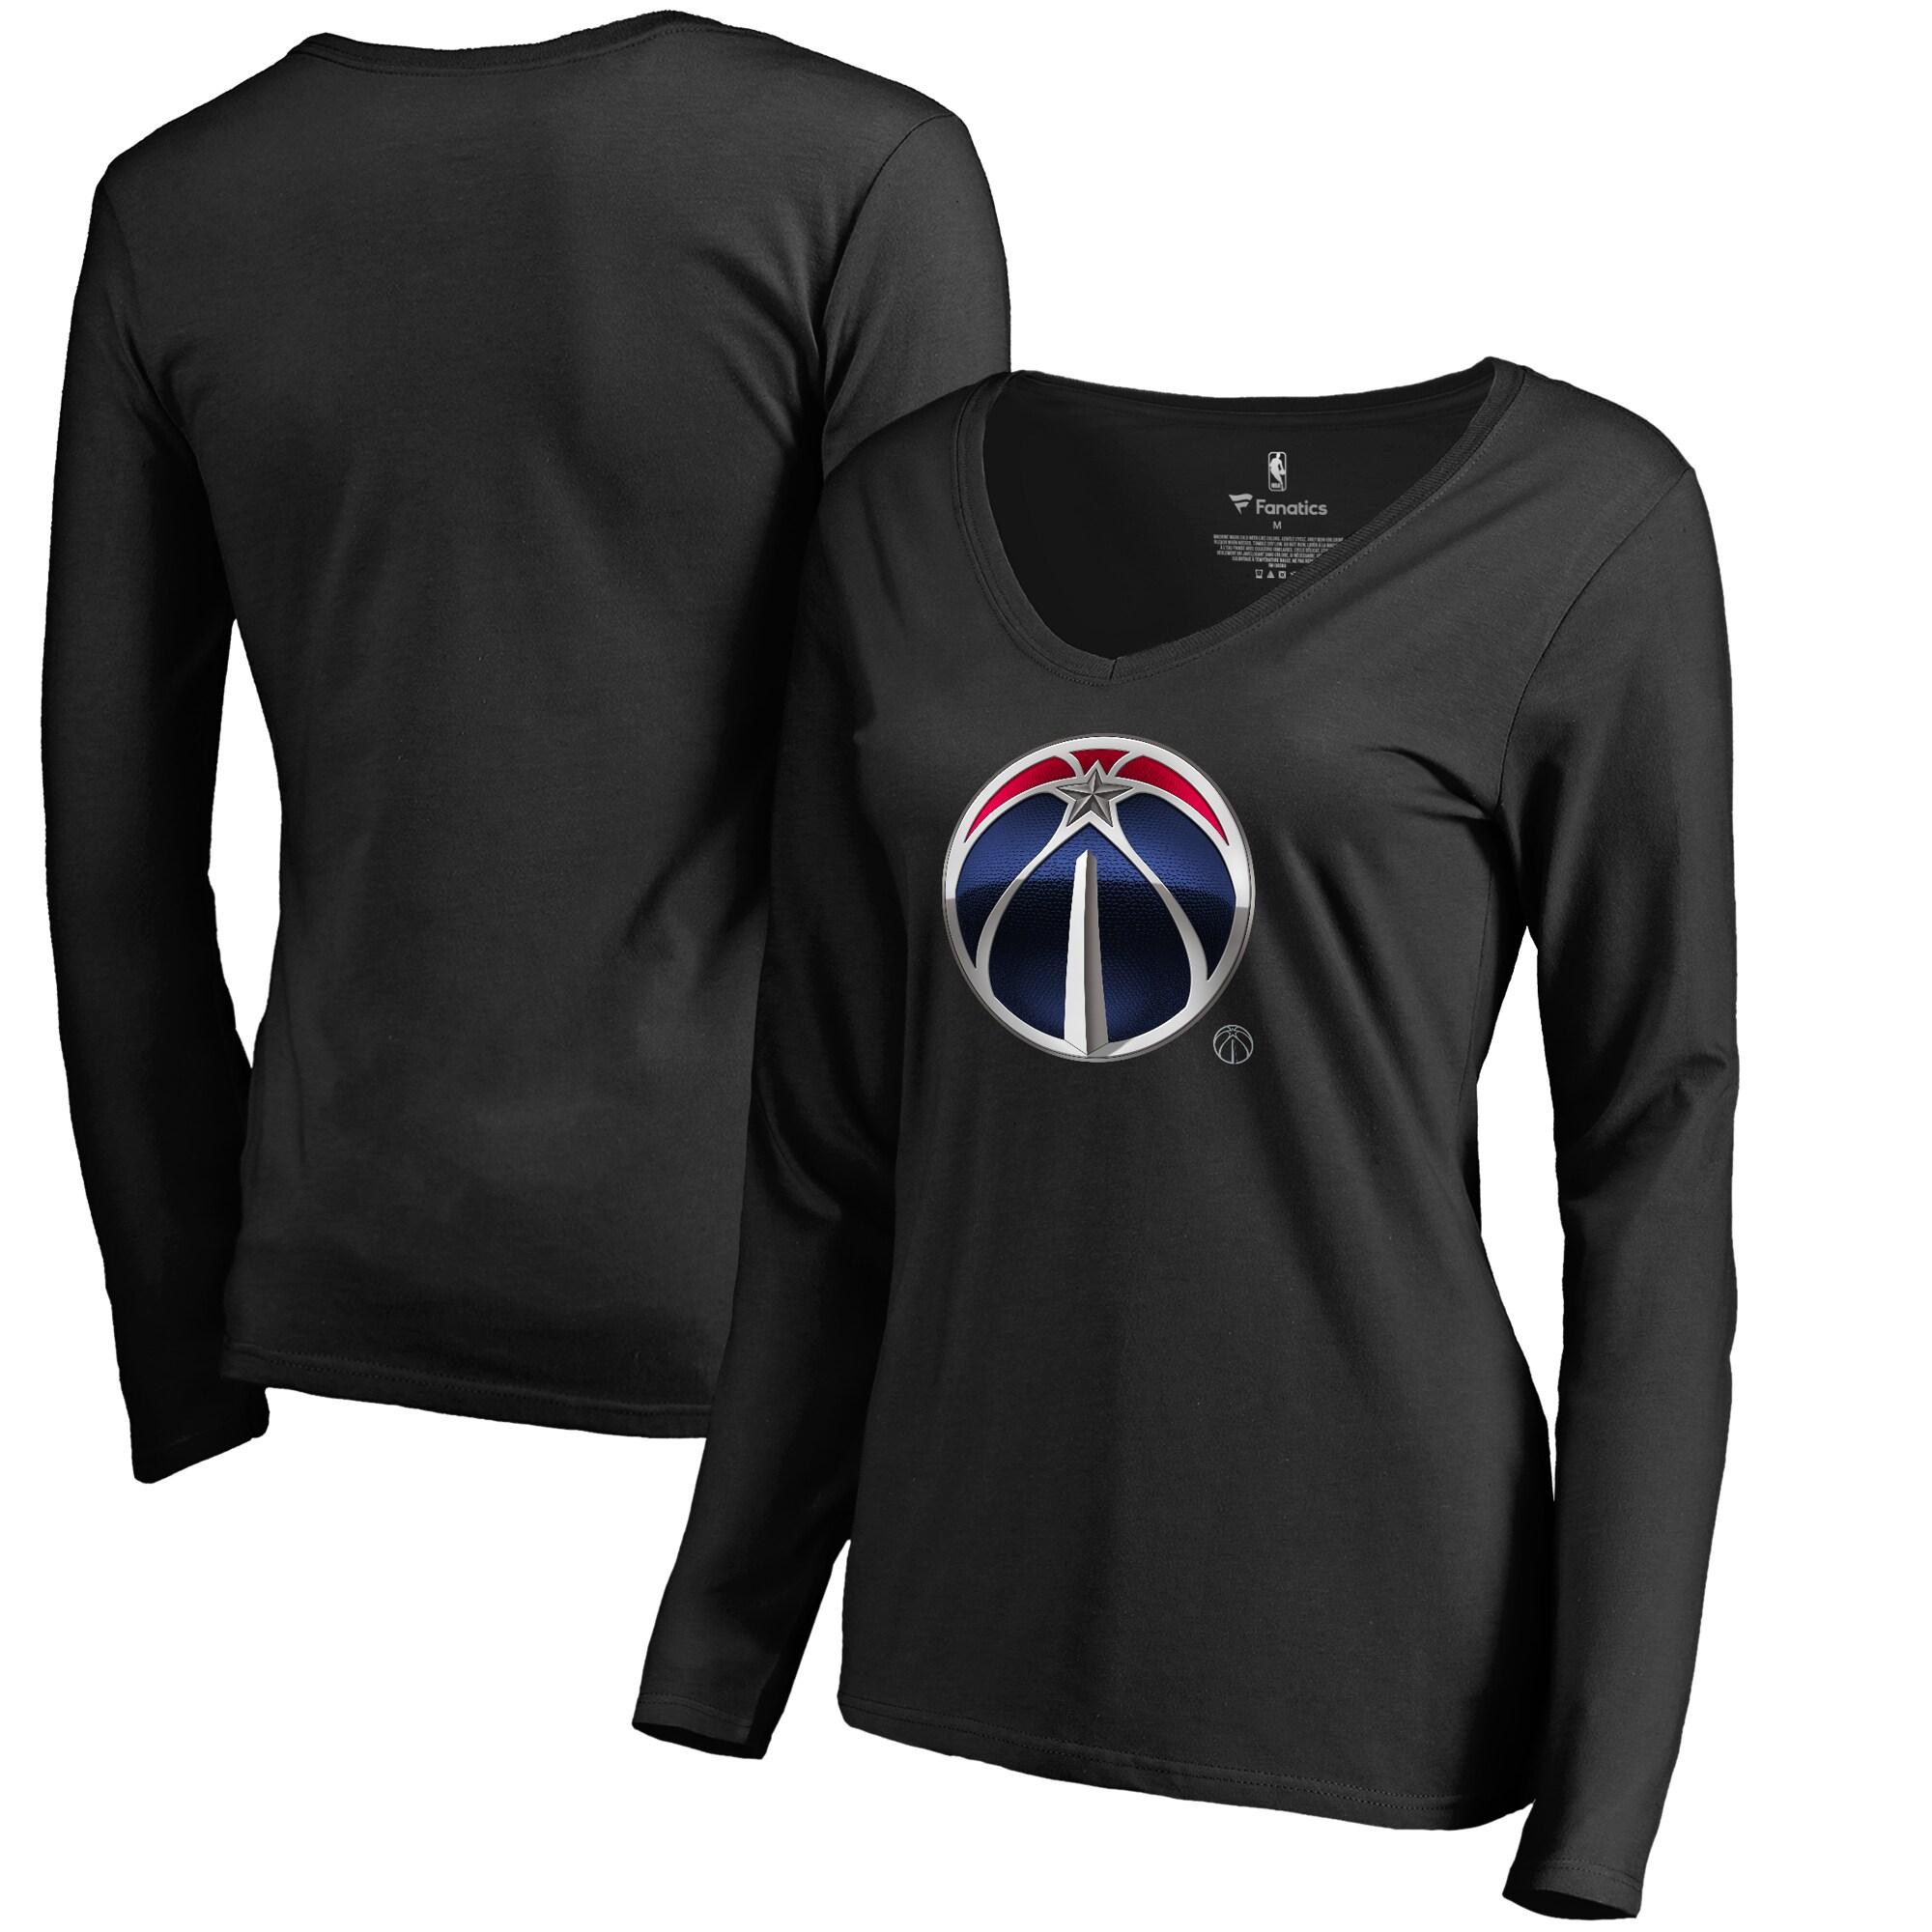 Washington Wizards Fanatics Branded Women's Midnight Mascot Long Sleeve V-Neck T-Shirt - Black